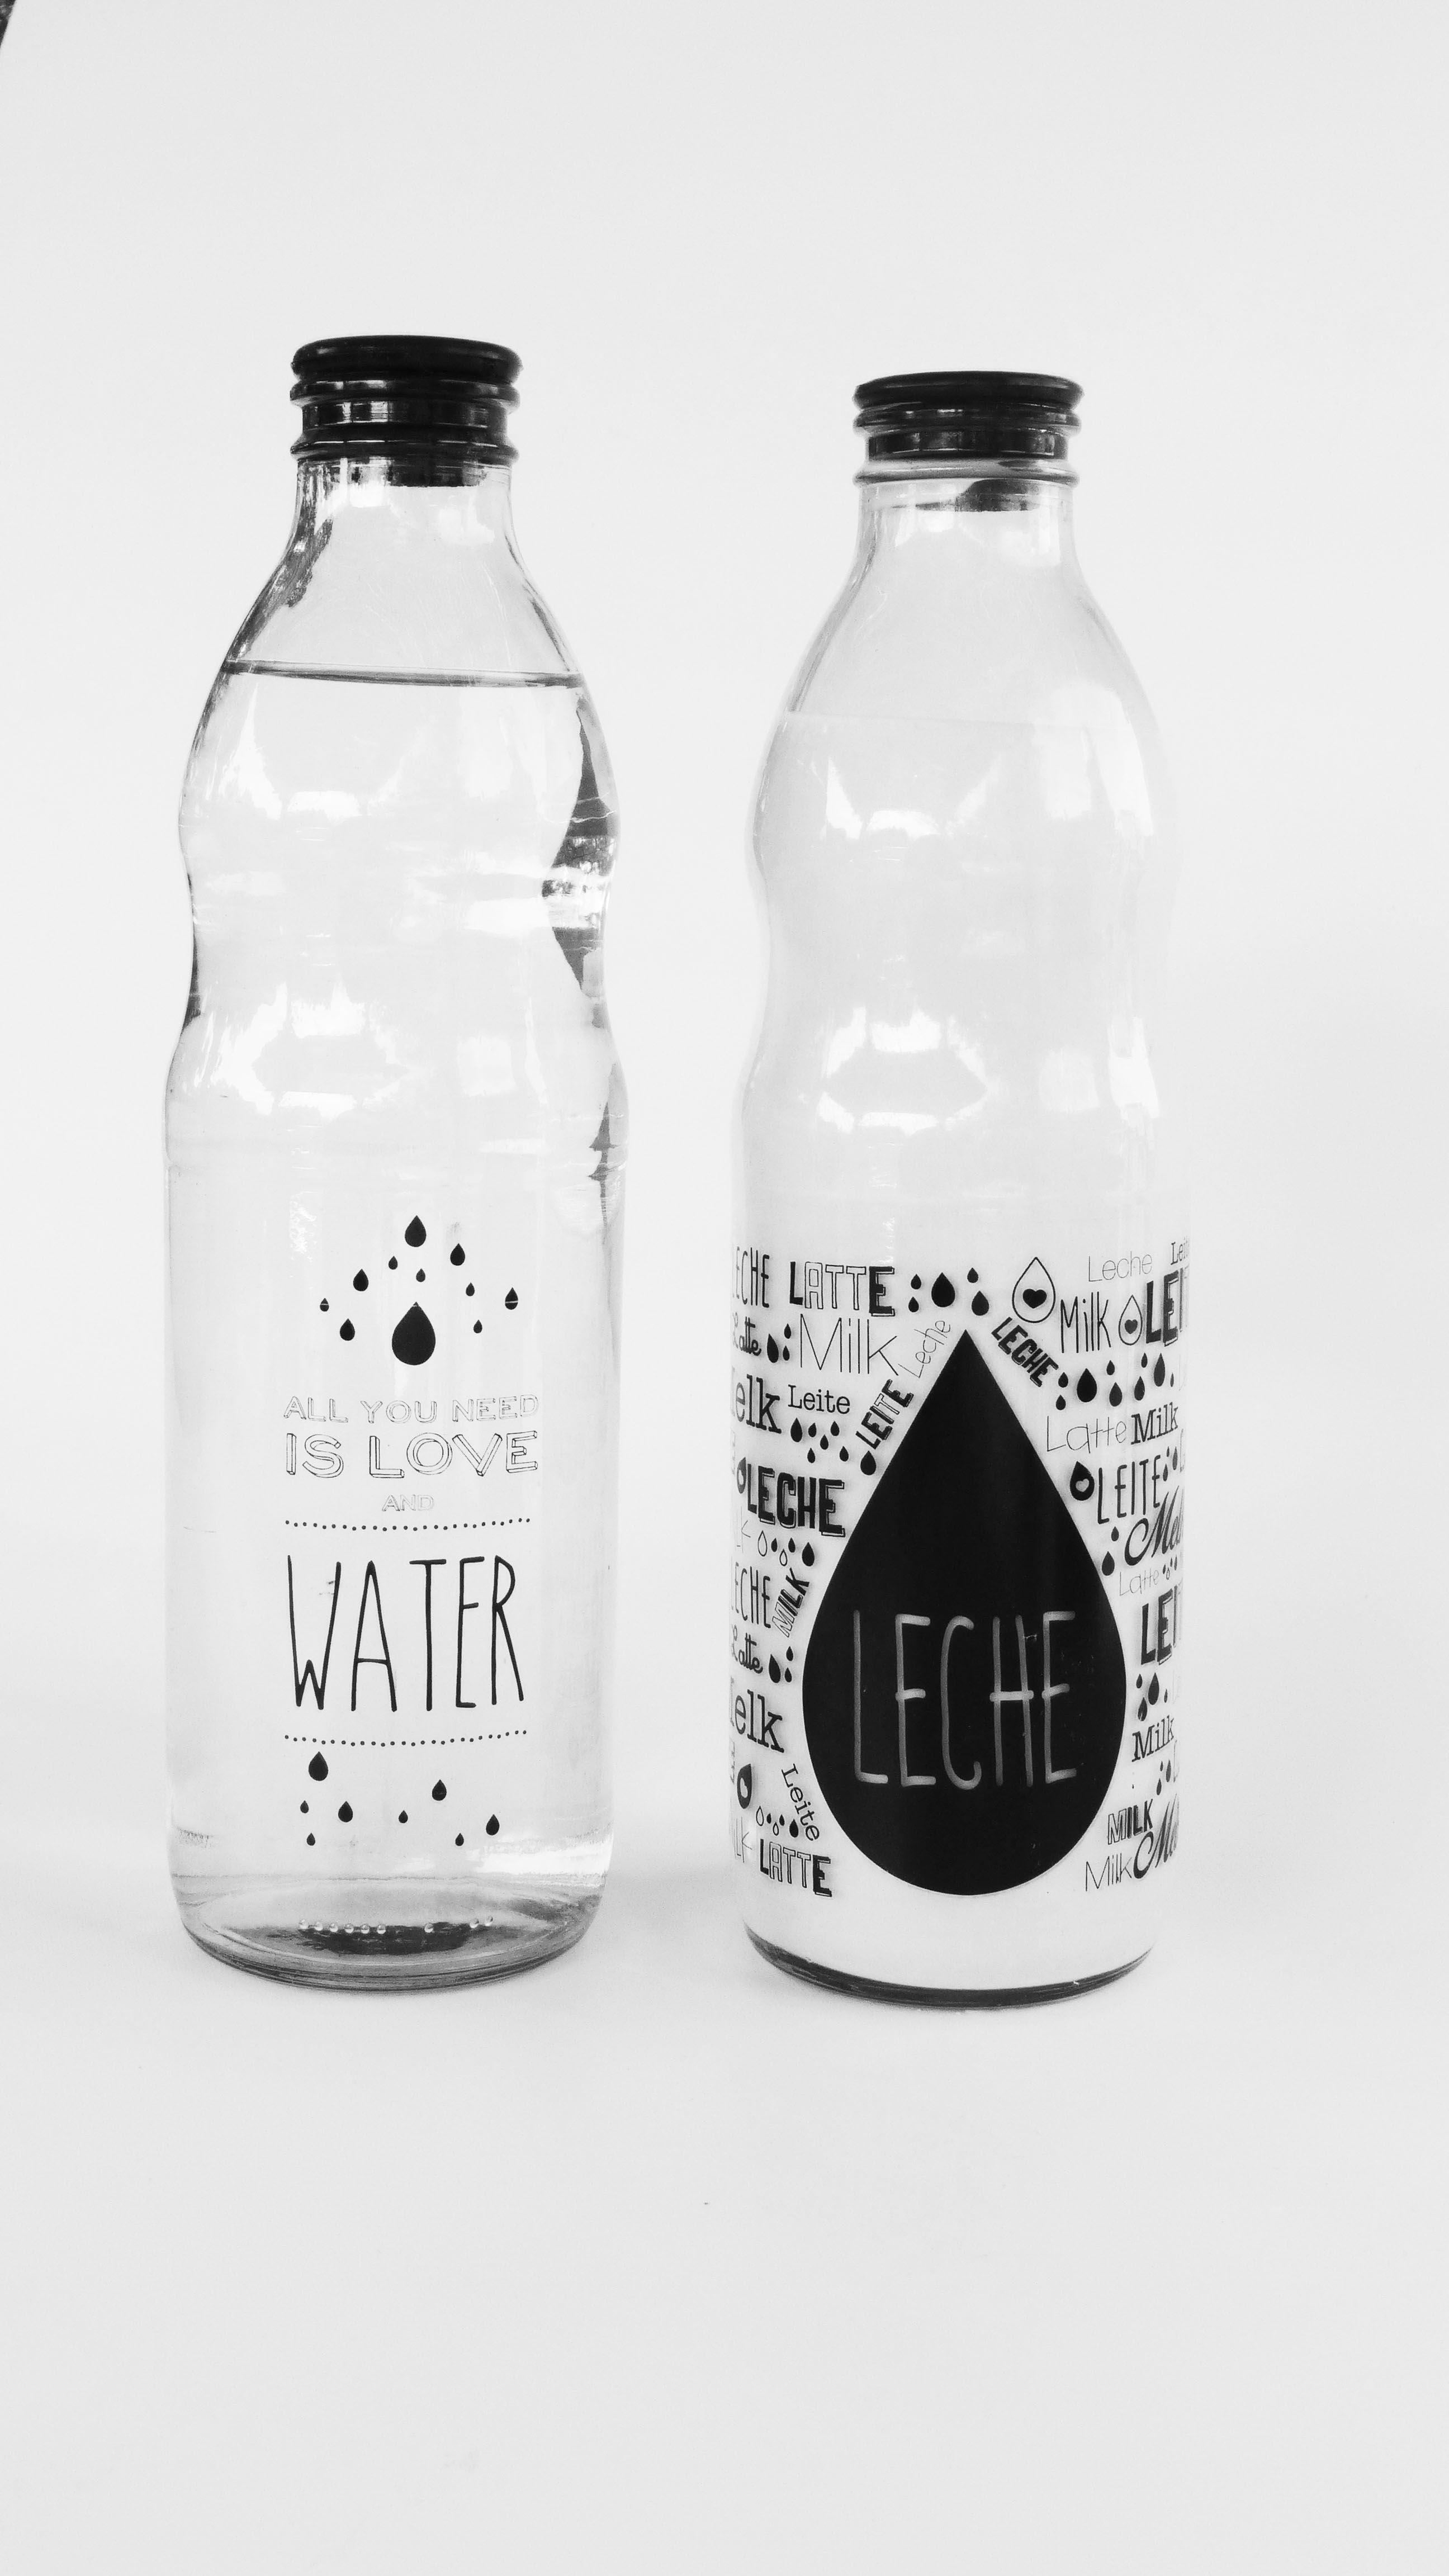 Botellas De Vidrio De 1 Litro Impresas Con Disenos Exclusivos Botellas De Vidrio Decoradas Tazas De Vidrio Botellas De Vidrio